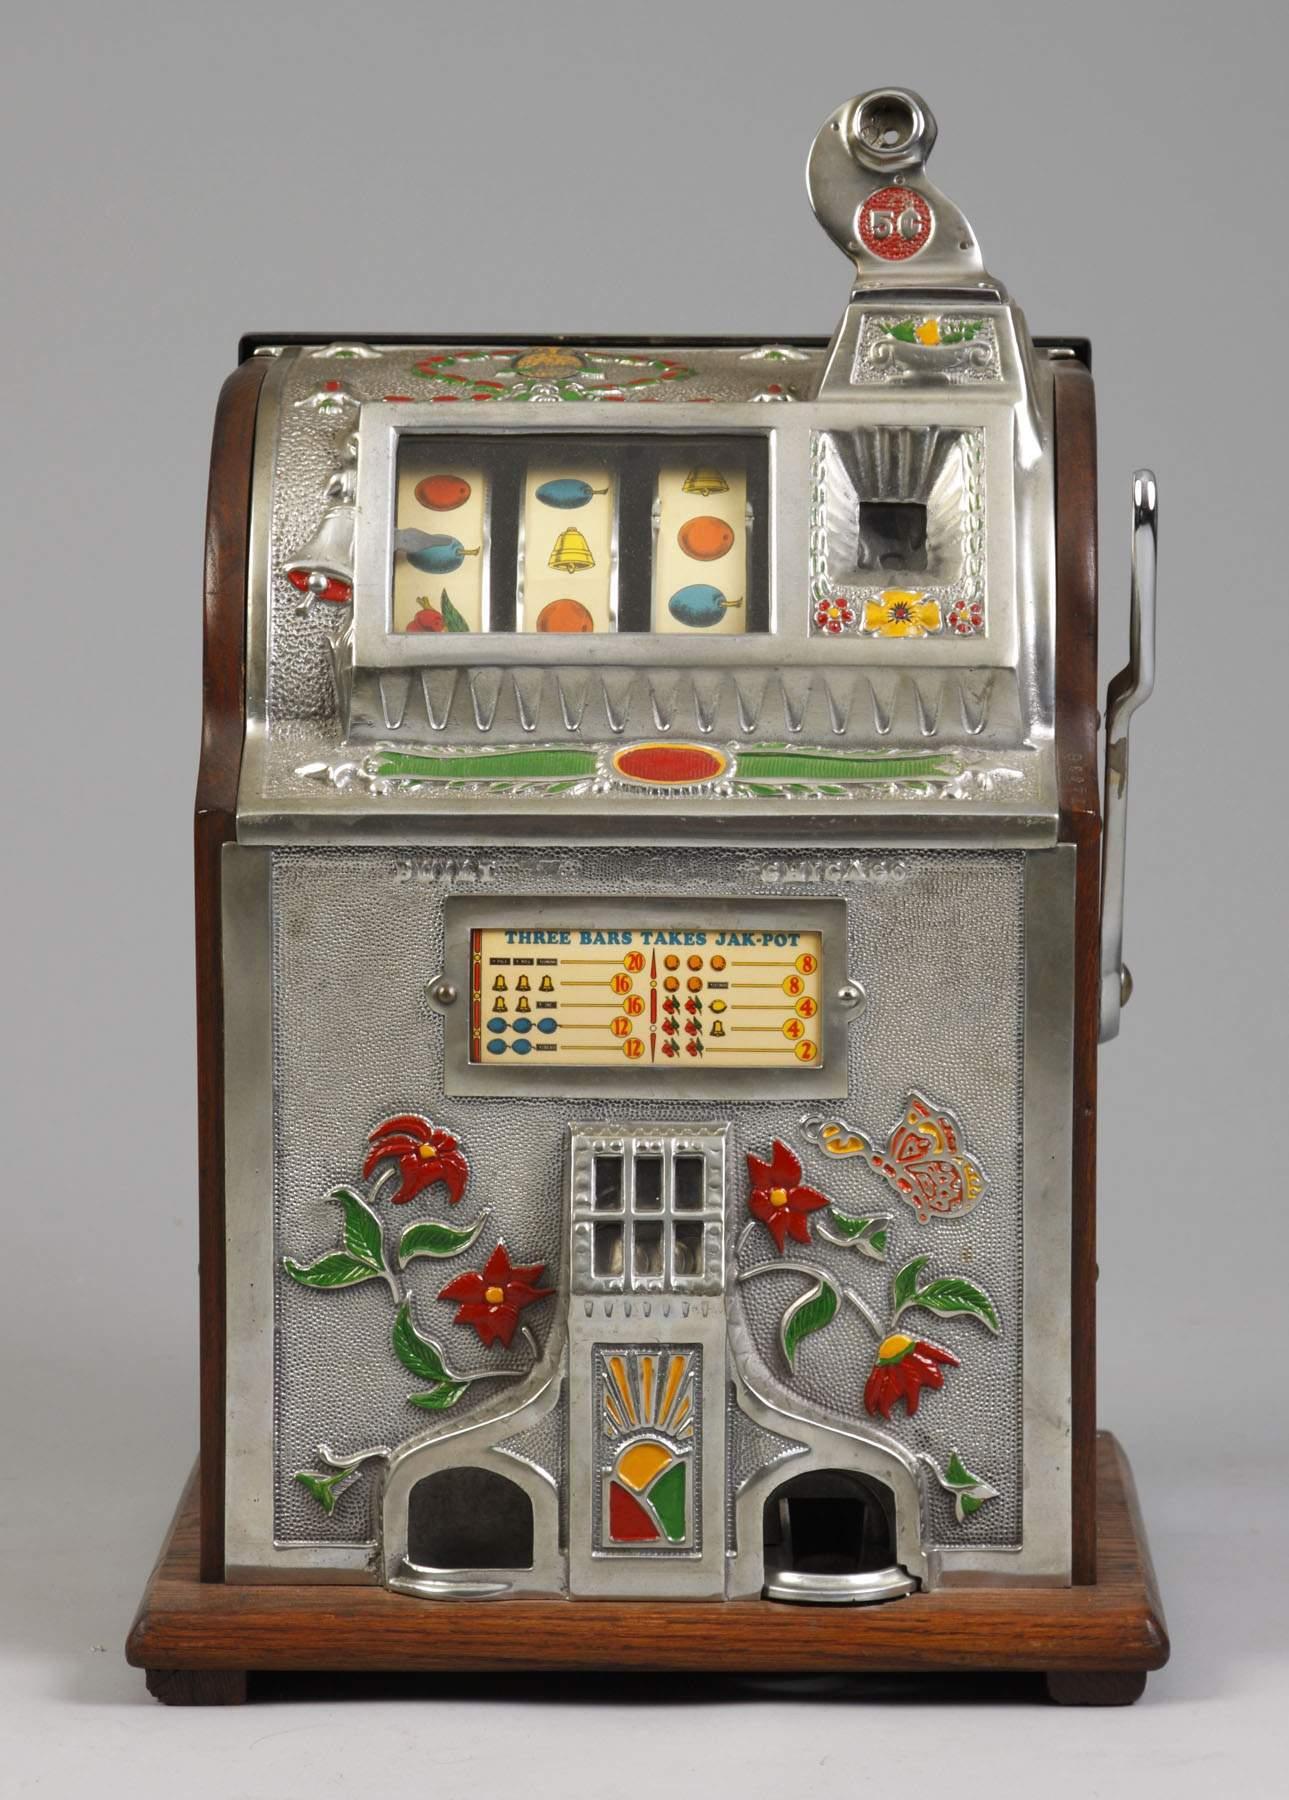 5 cent slot machine